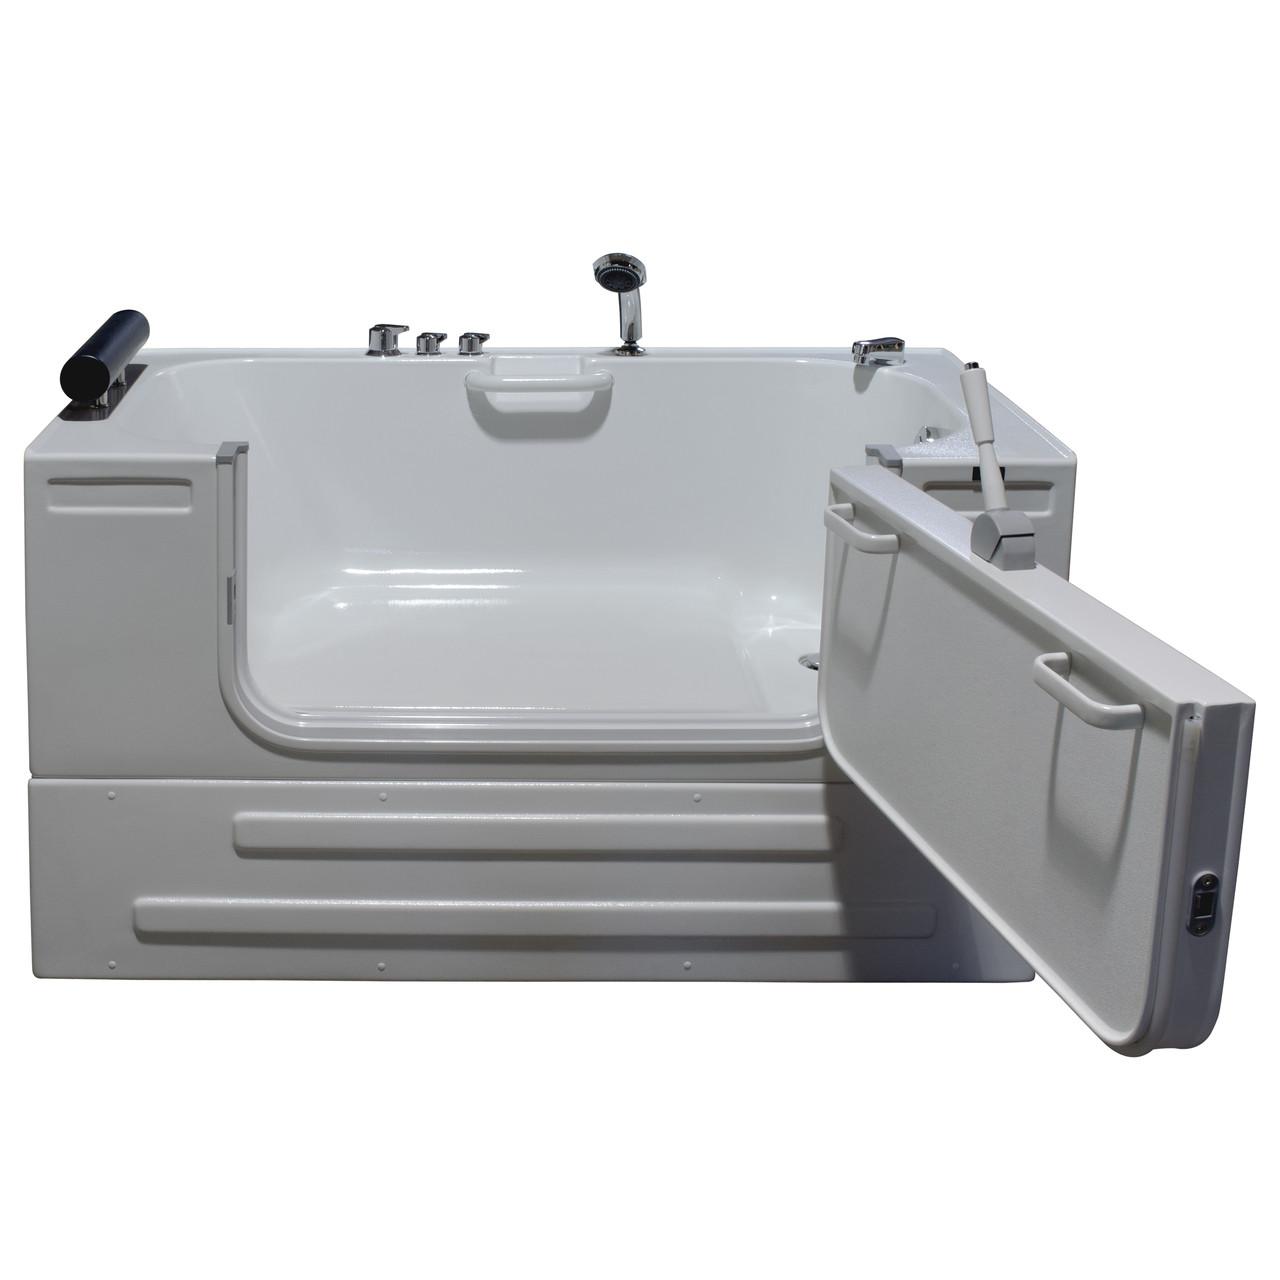 Homeward bath soaking sit in tub 3ft wide outward opening for Wide tub